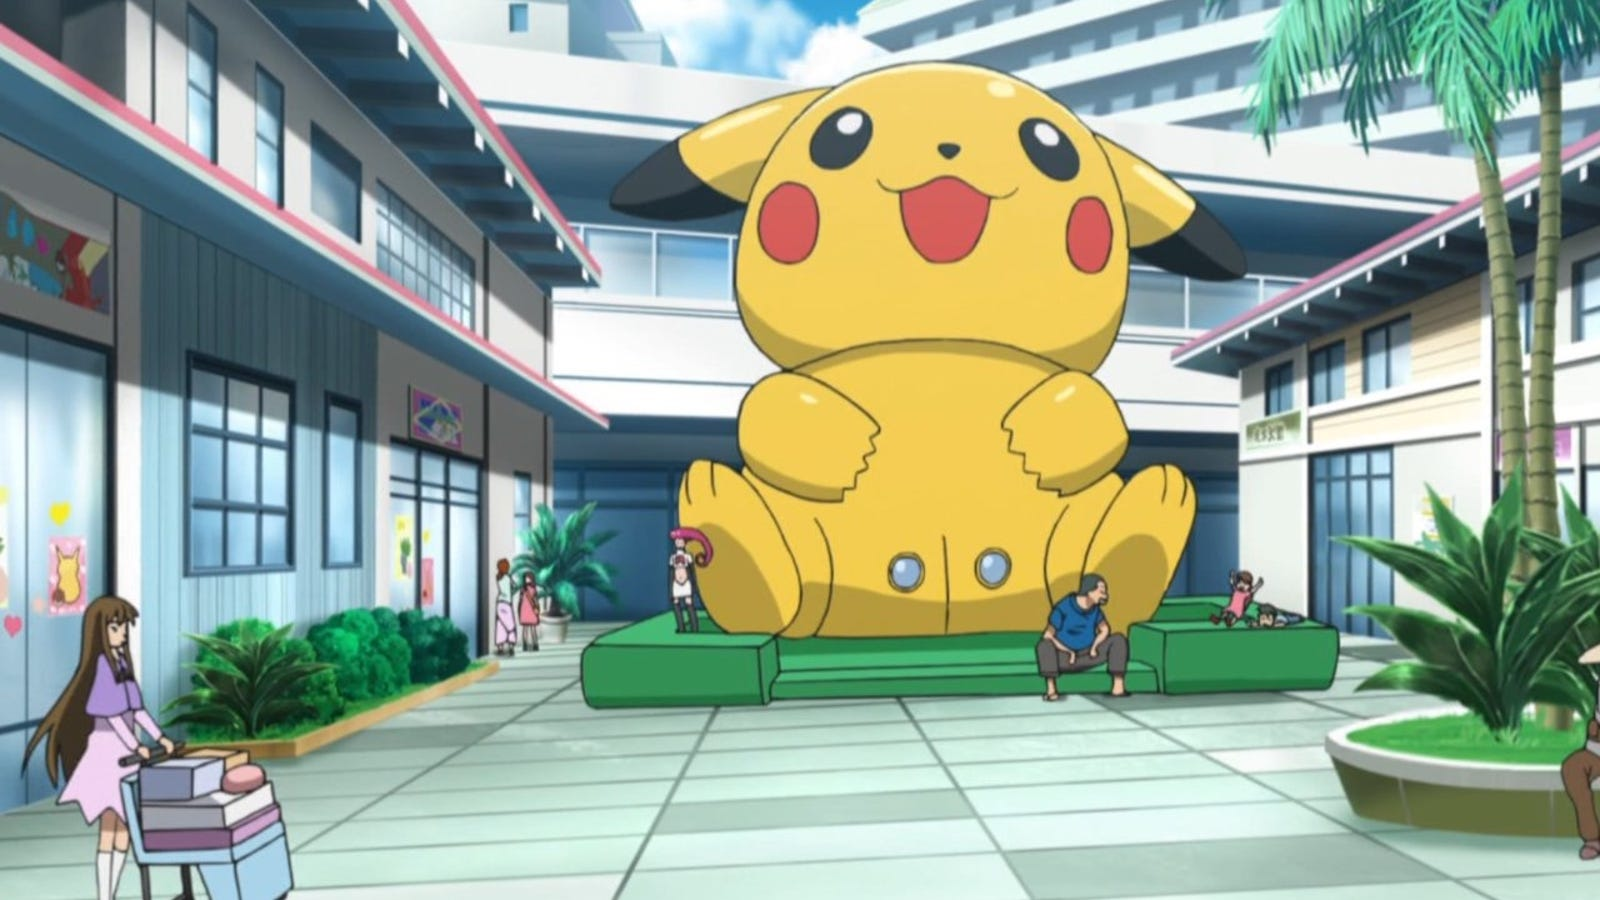 pikachu's vagina bounce house makes anime cameo